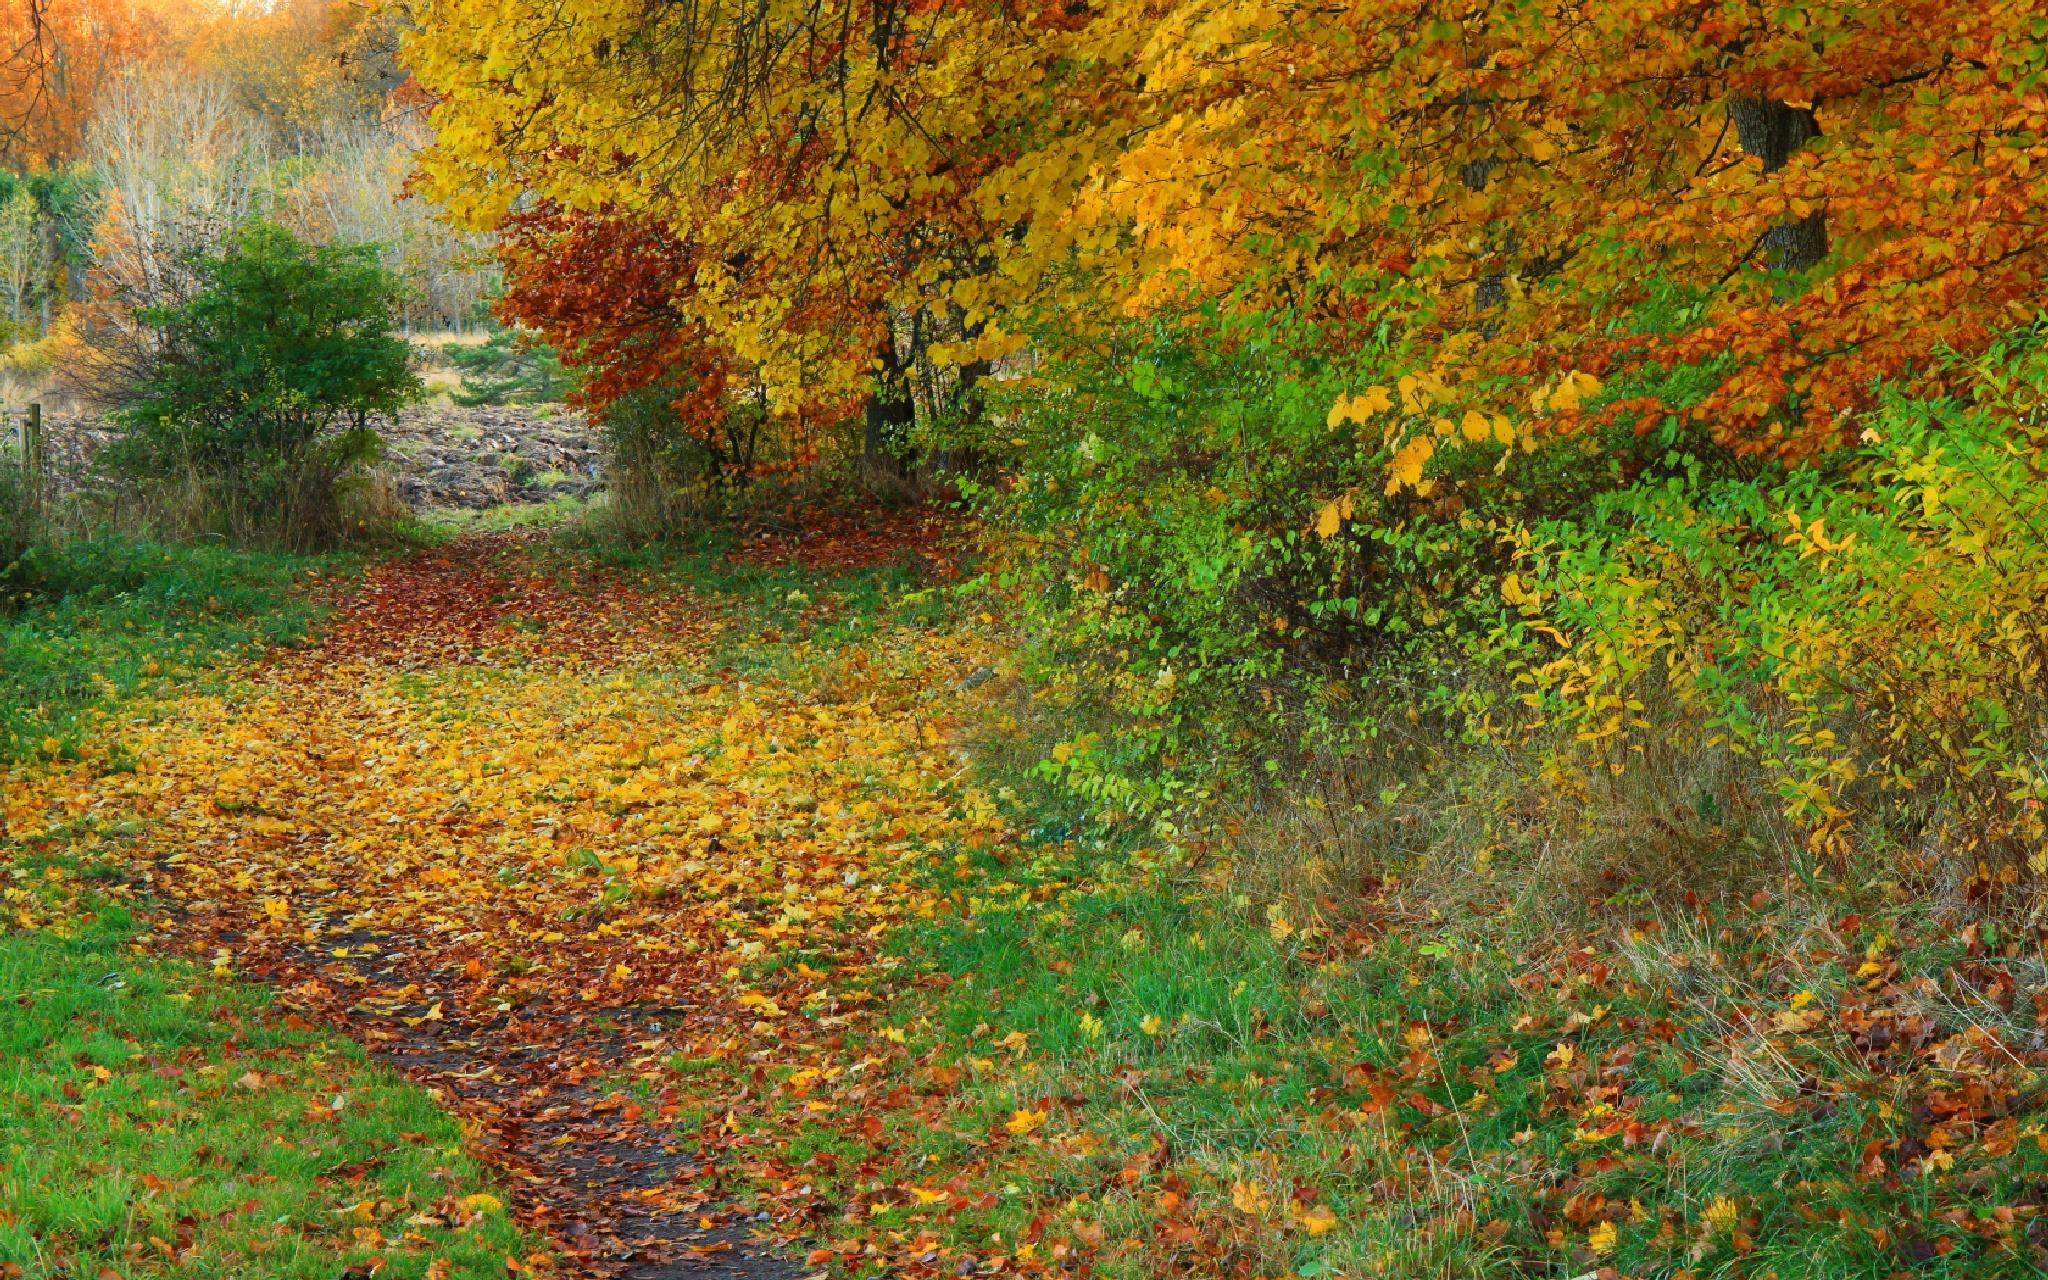 Autumn colors by micke.wallman